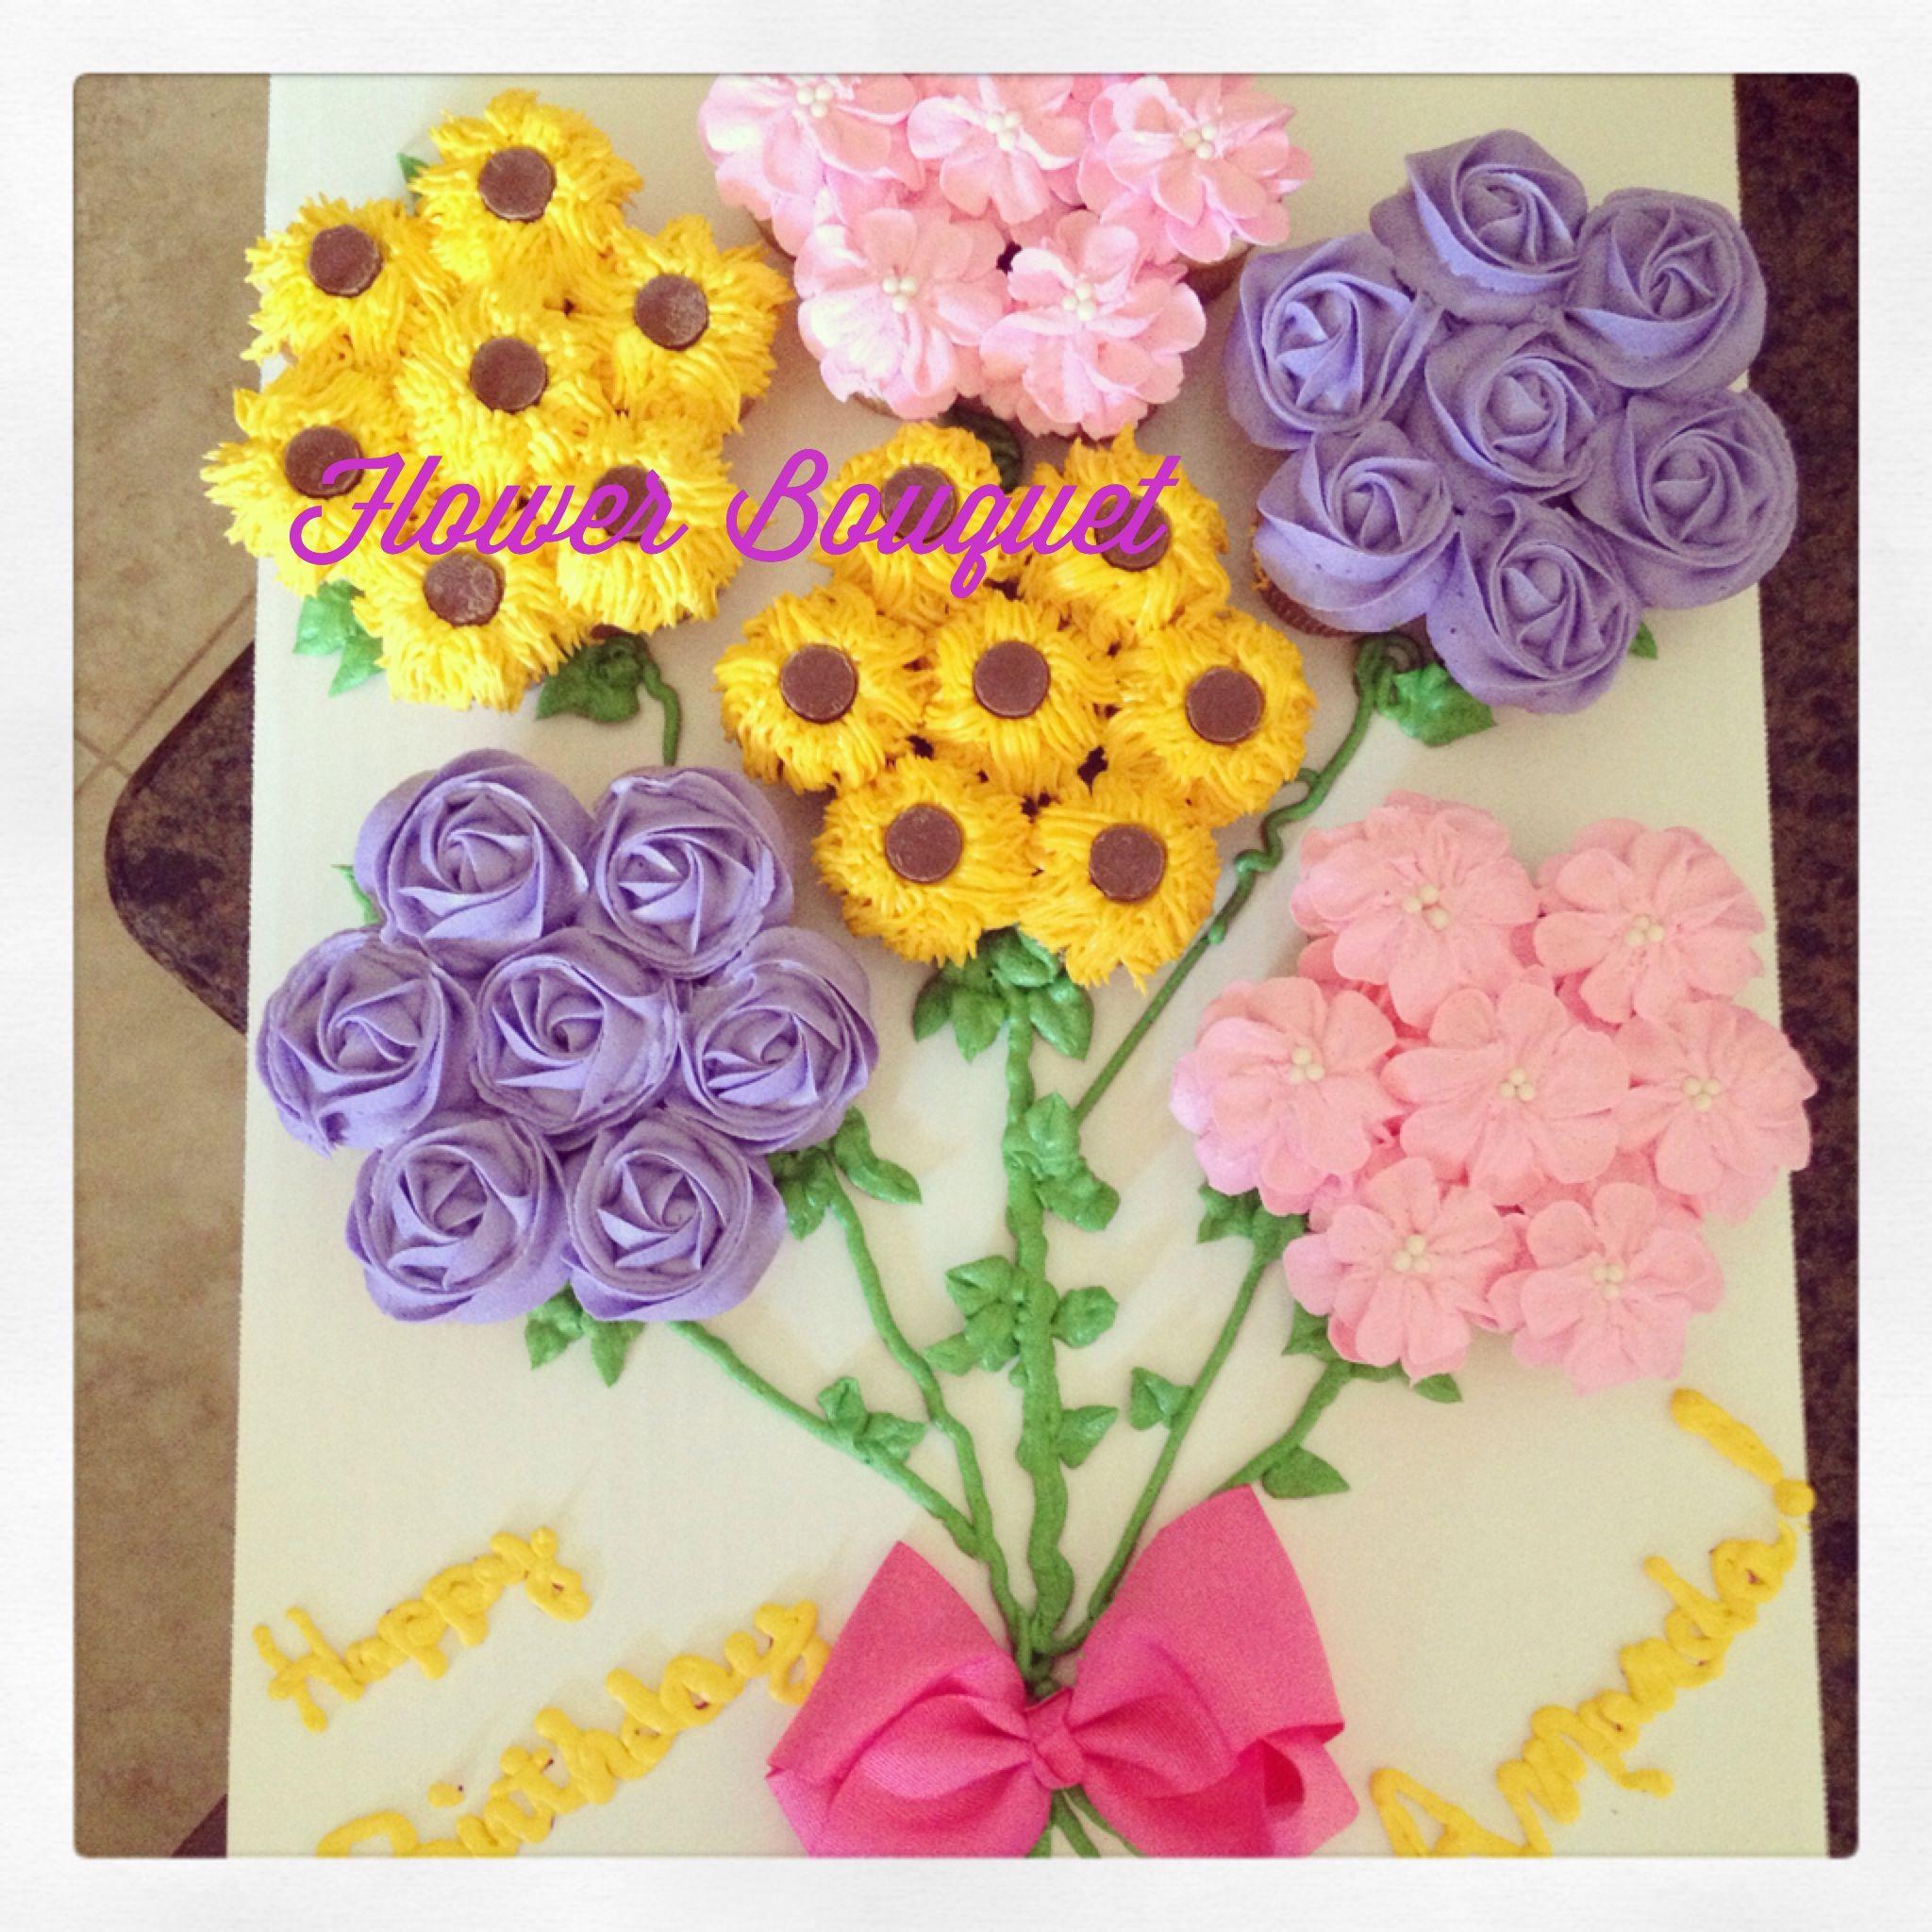 Cupcake flower bouquet adorable cake designs pinterest cupcake flower bouquet adorable izmirmasajfo